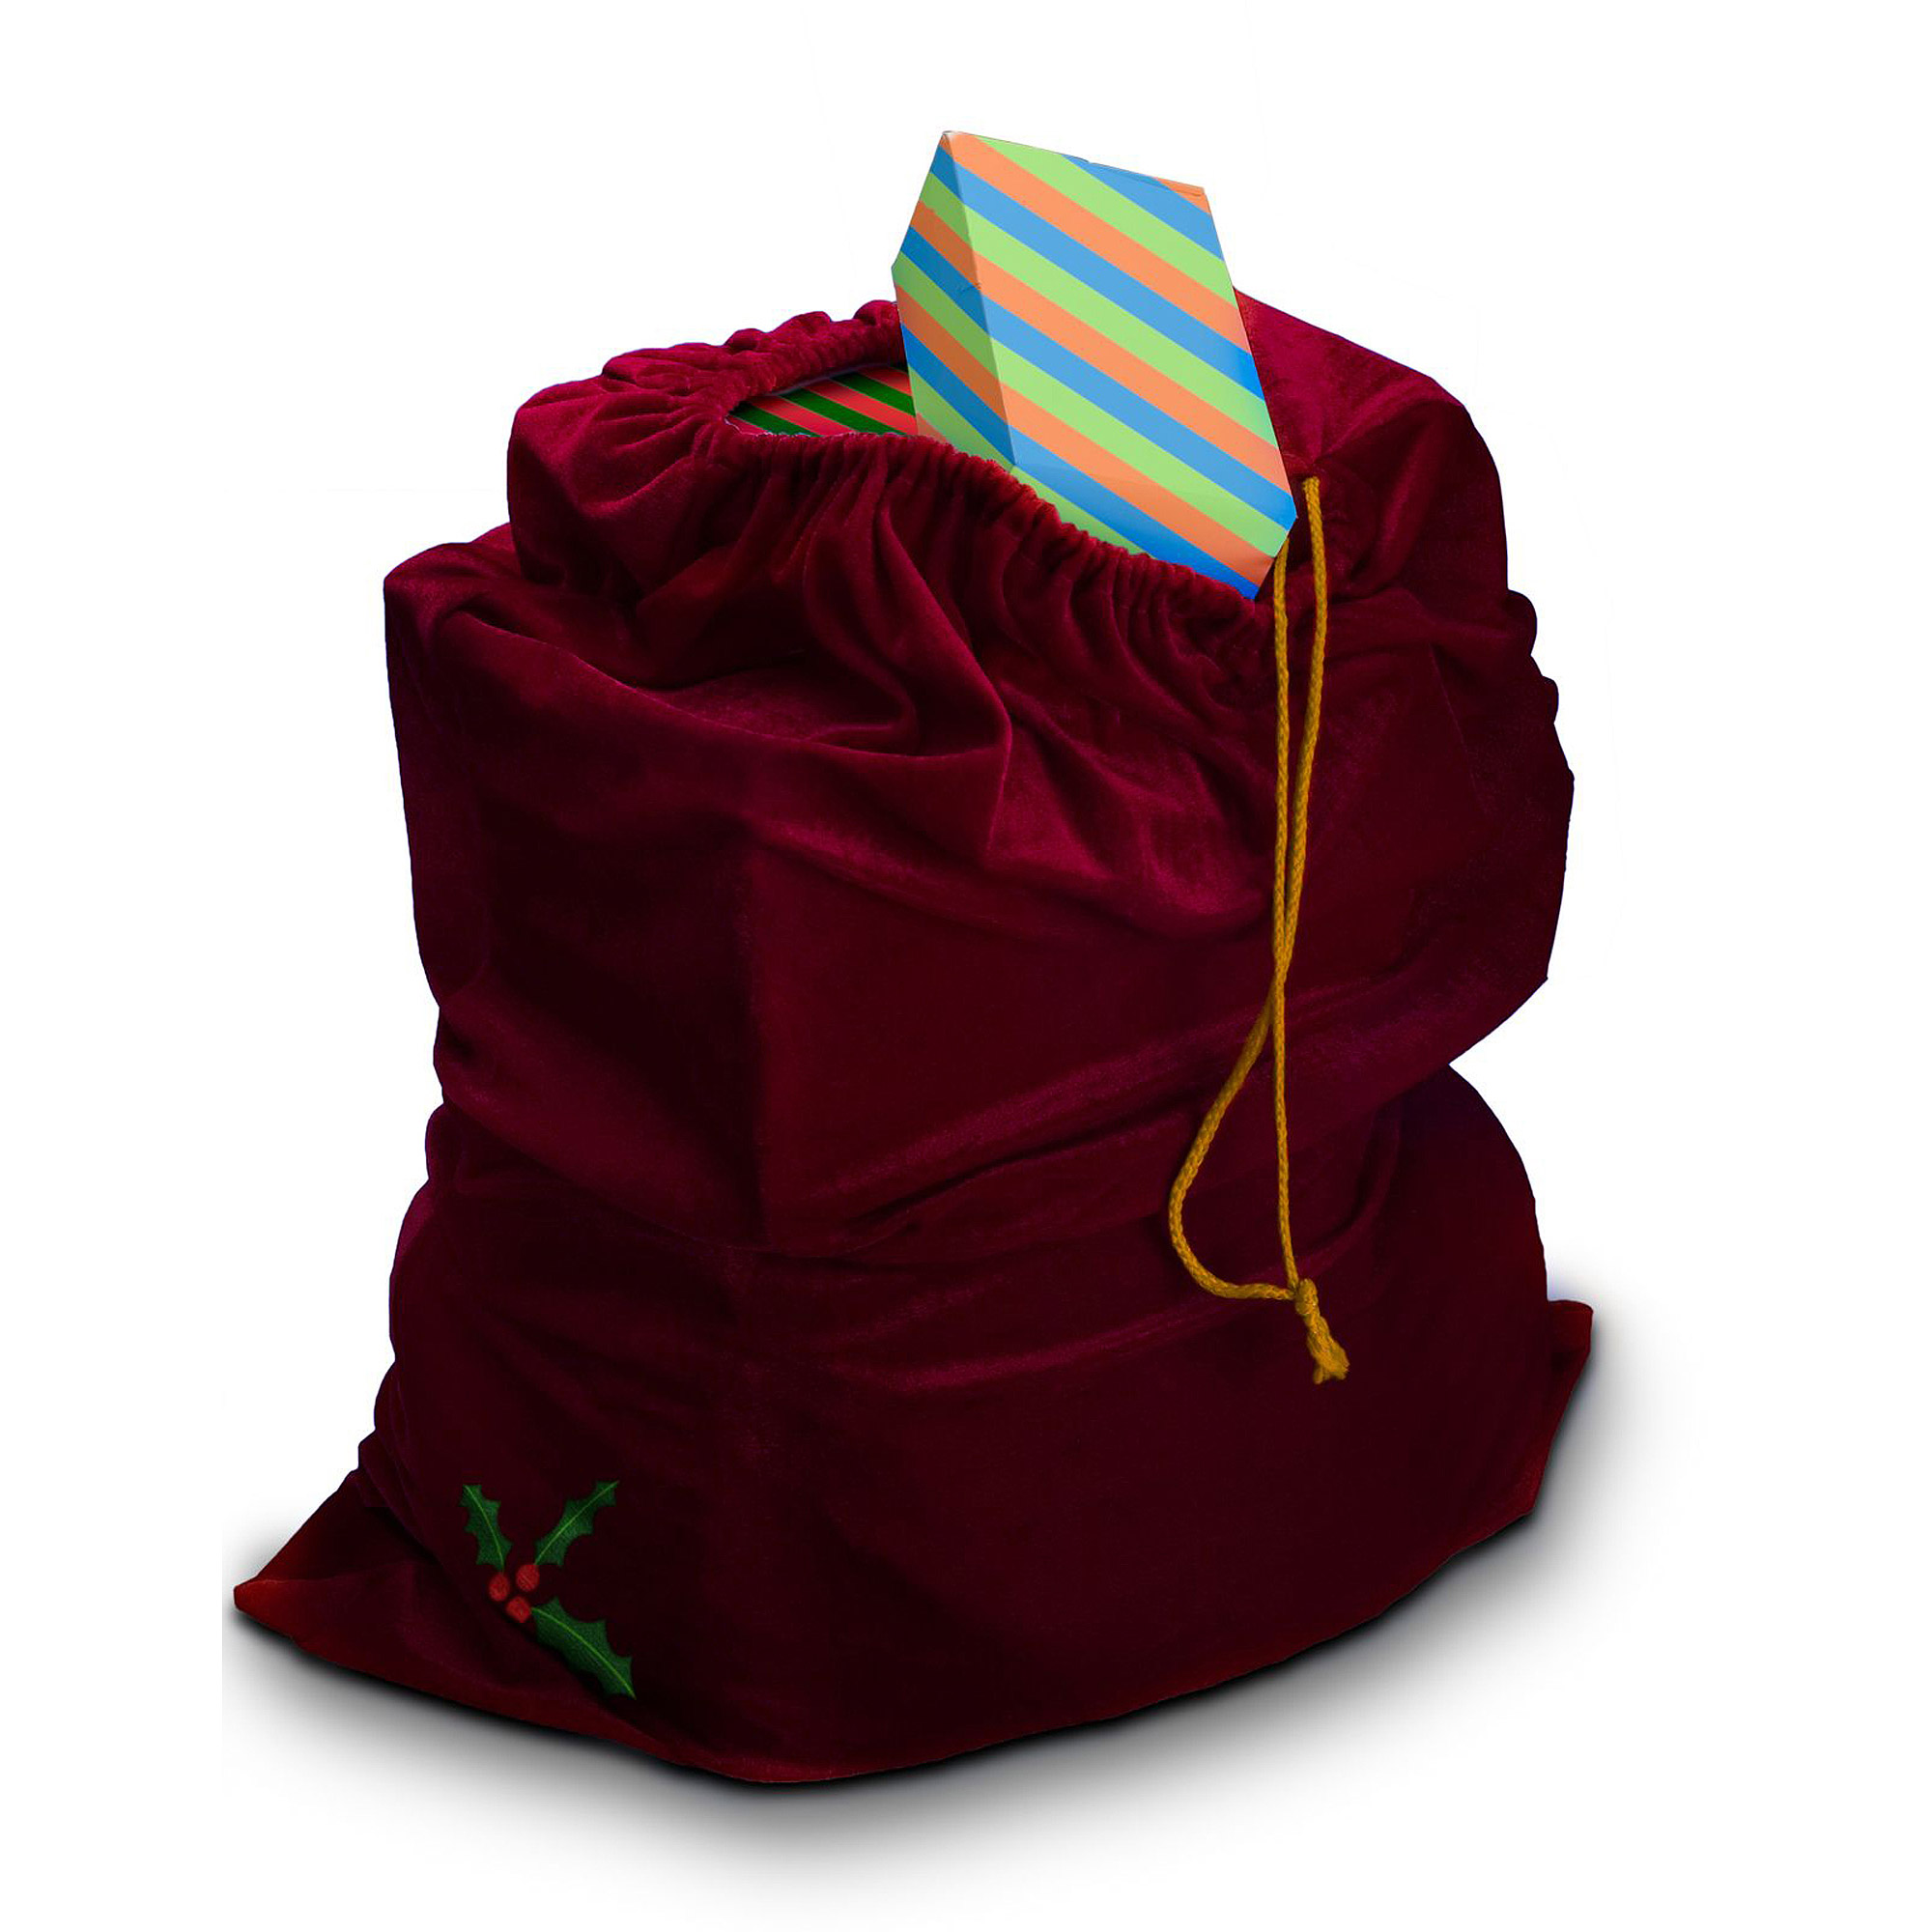 Sunnywood Santa Drawstring Gift Bag In Red Walmart Com